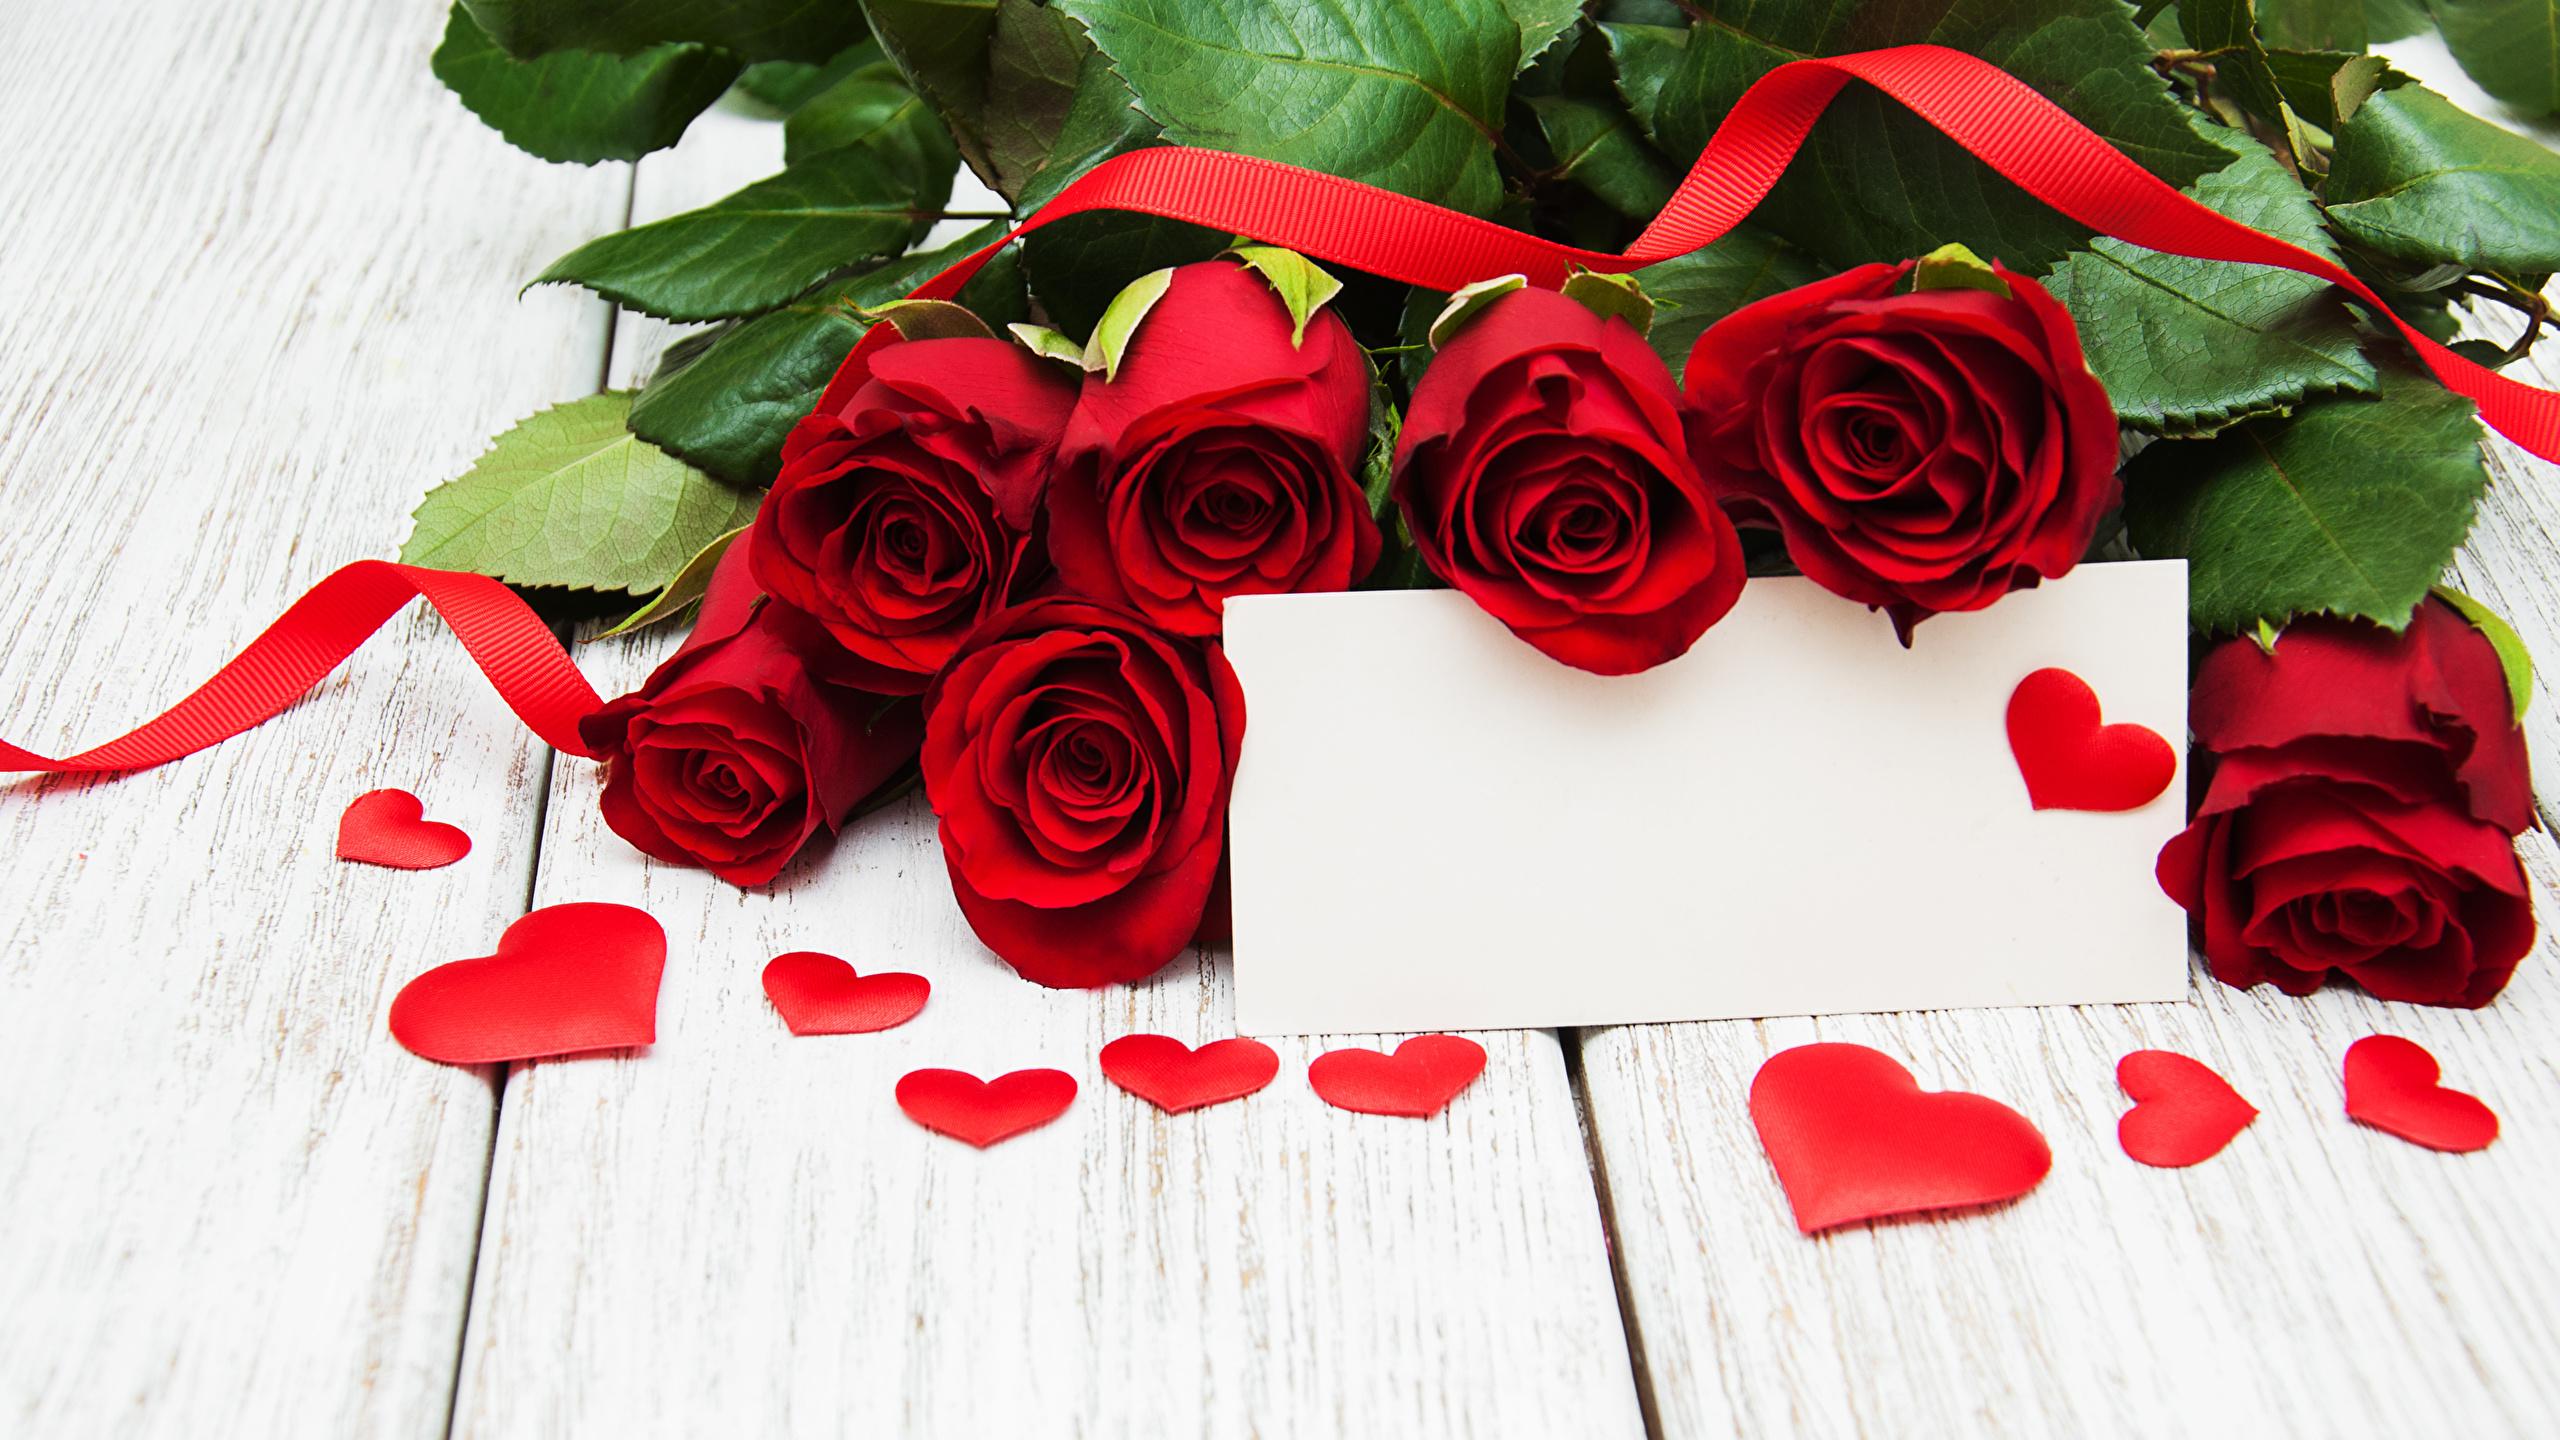 Фото цветы сердце с розами